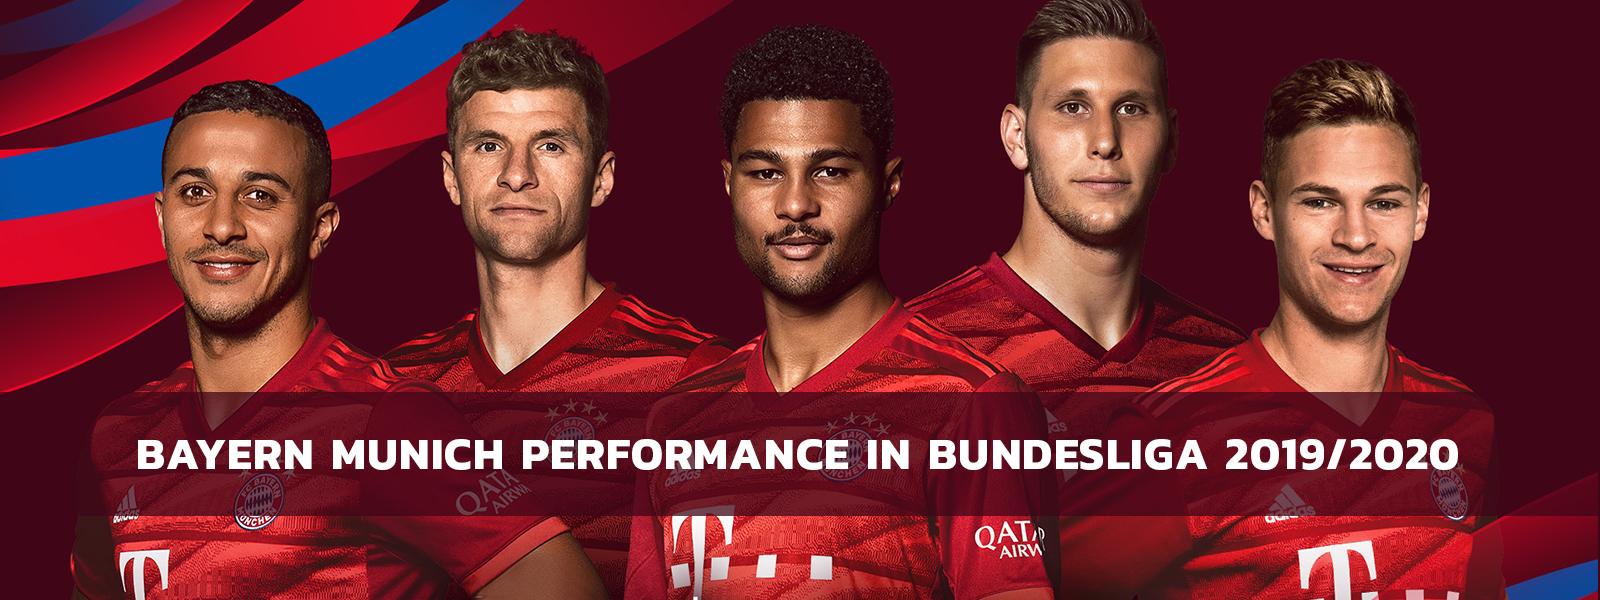 Bayern Munich Performance in Bundesliga 2019/2020